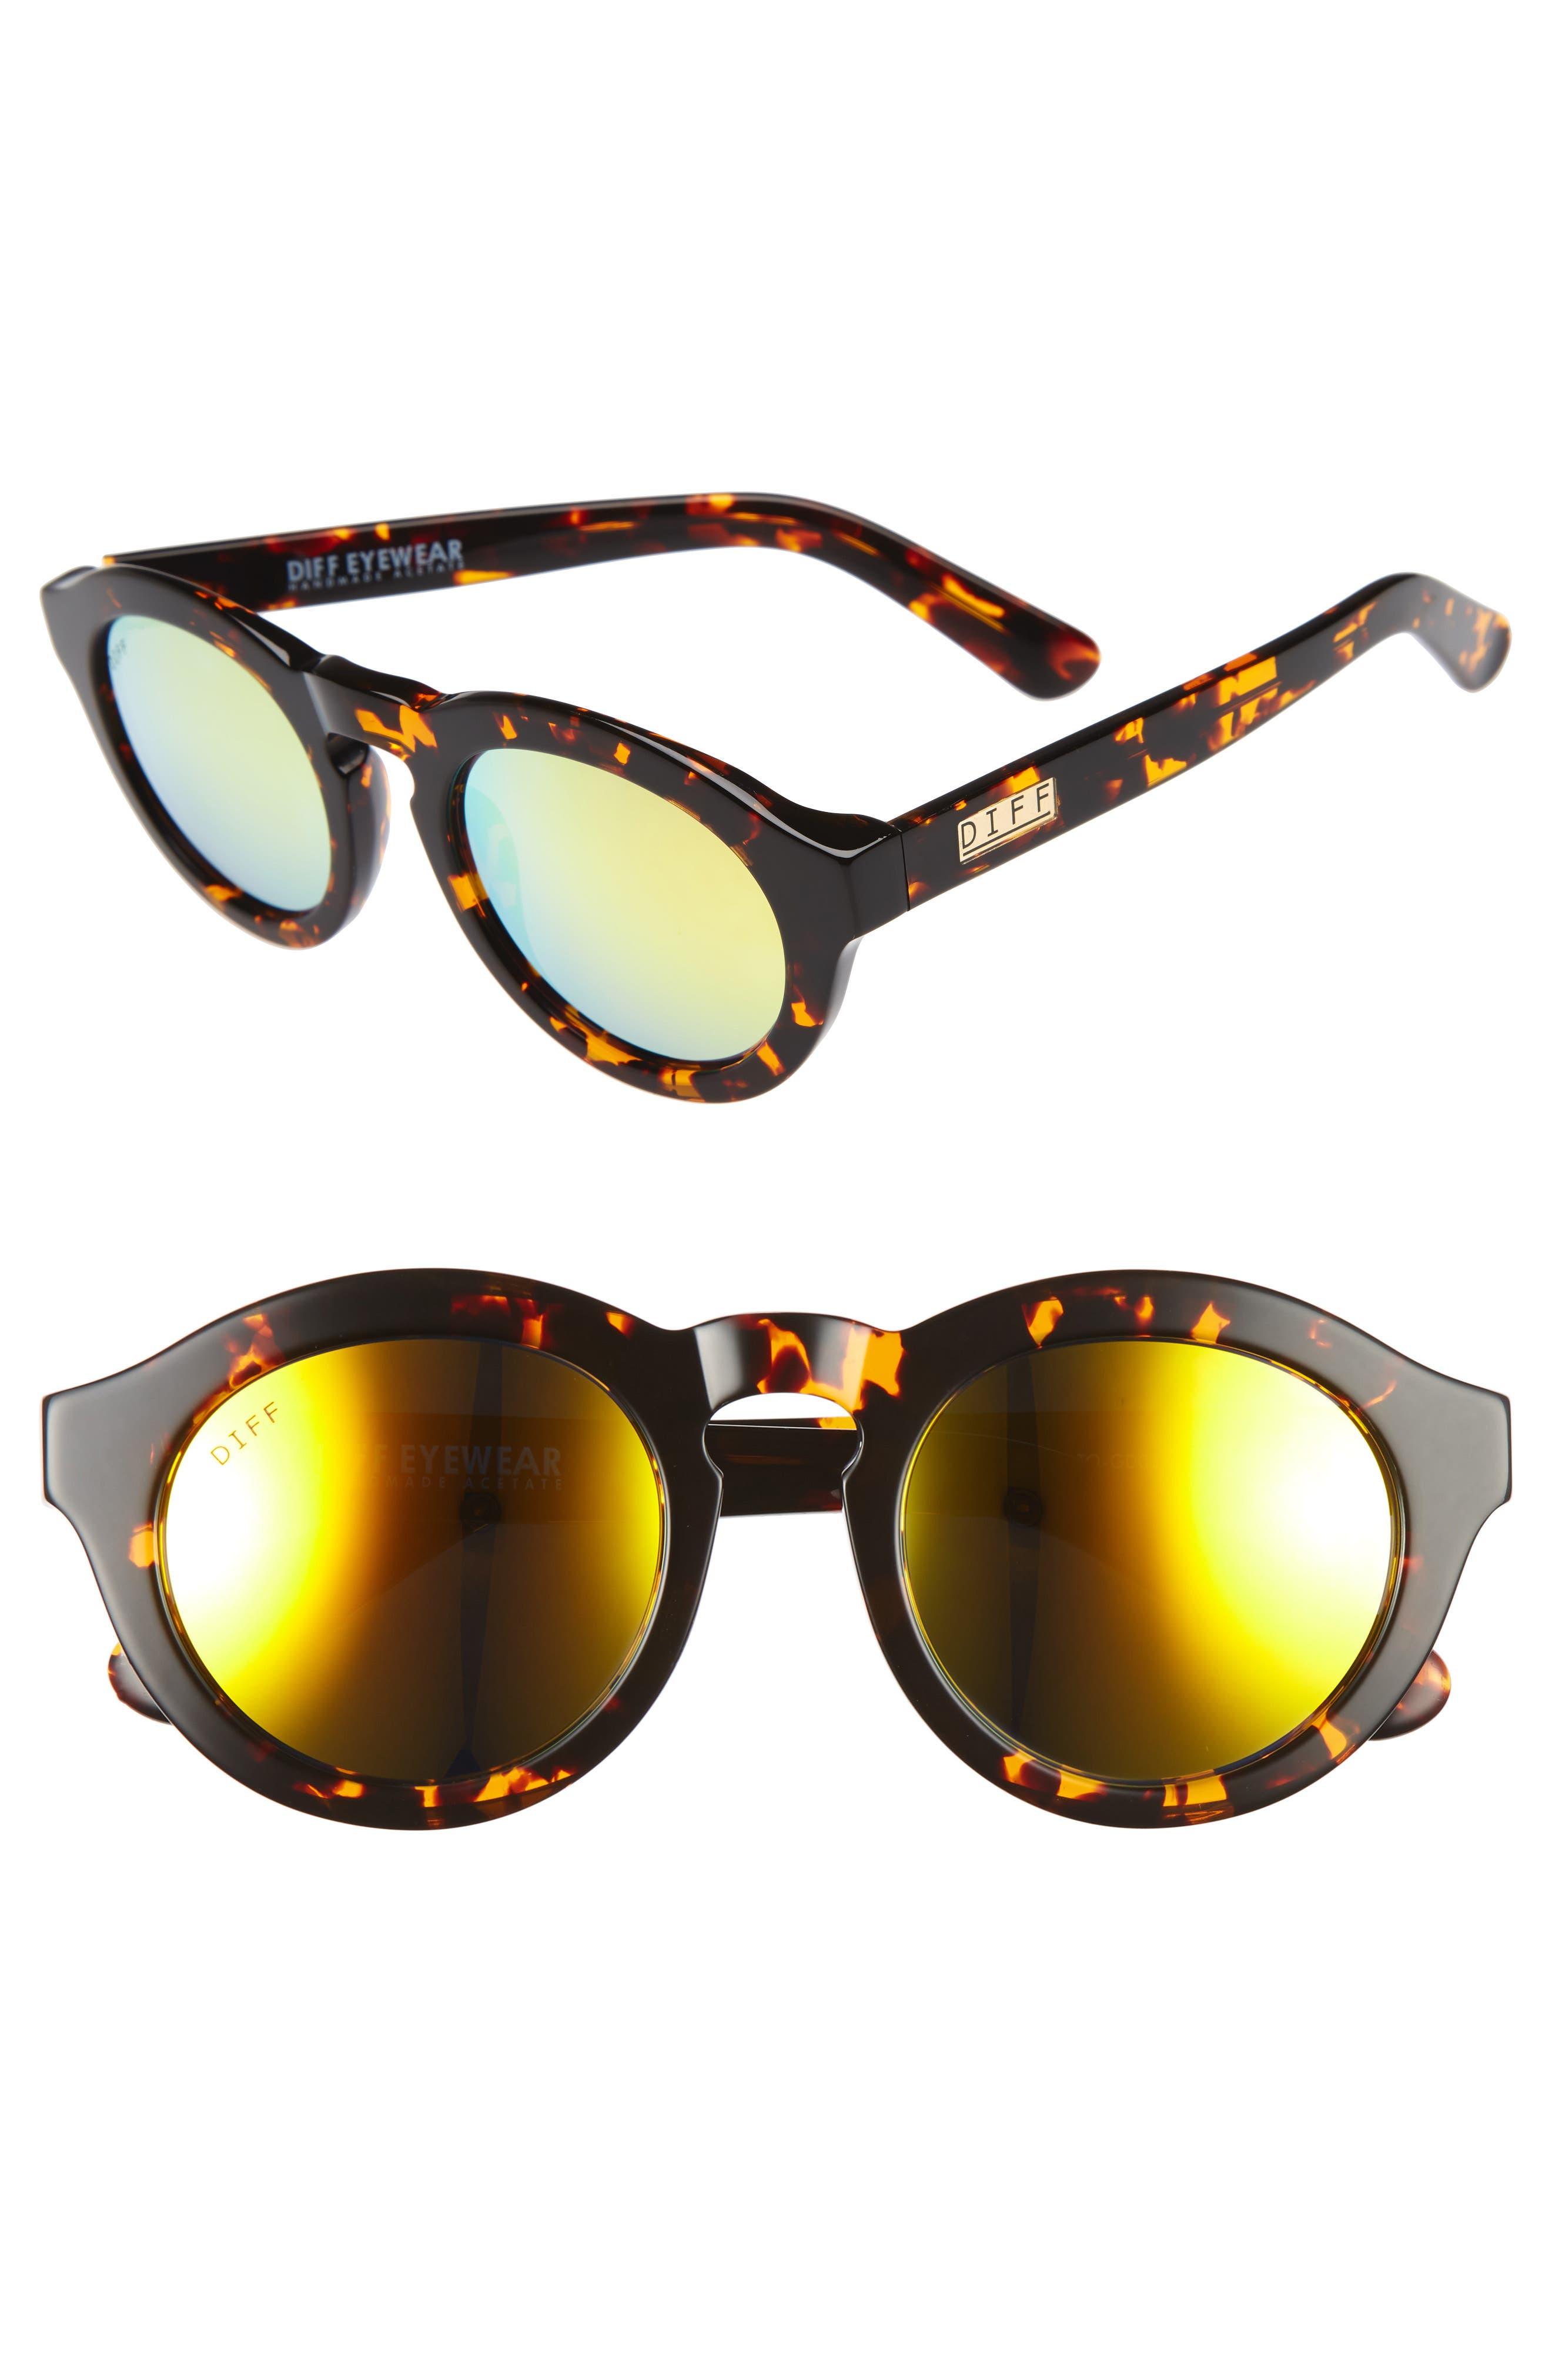 Main Image - DIFF Dime 48mm Retro Sunglasses